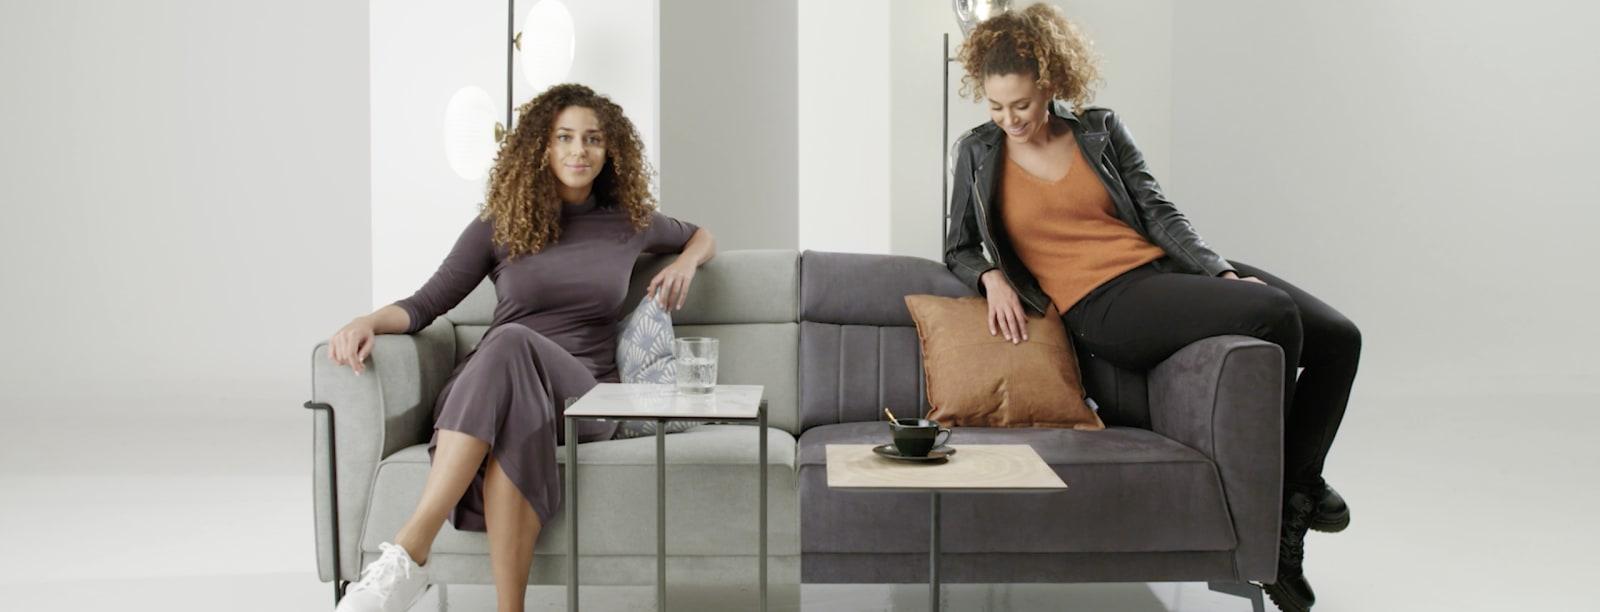 1 canapé, 2 styles différents